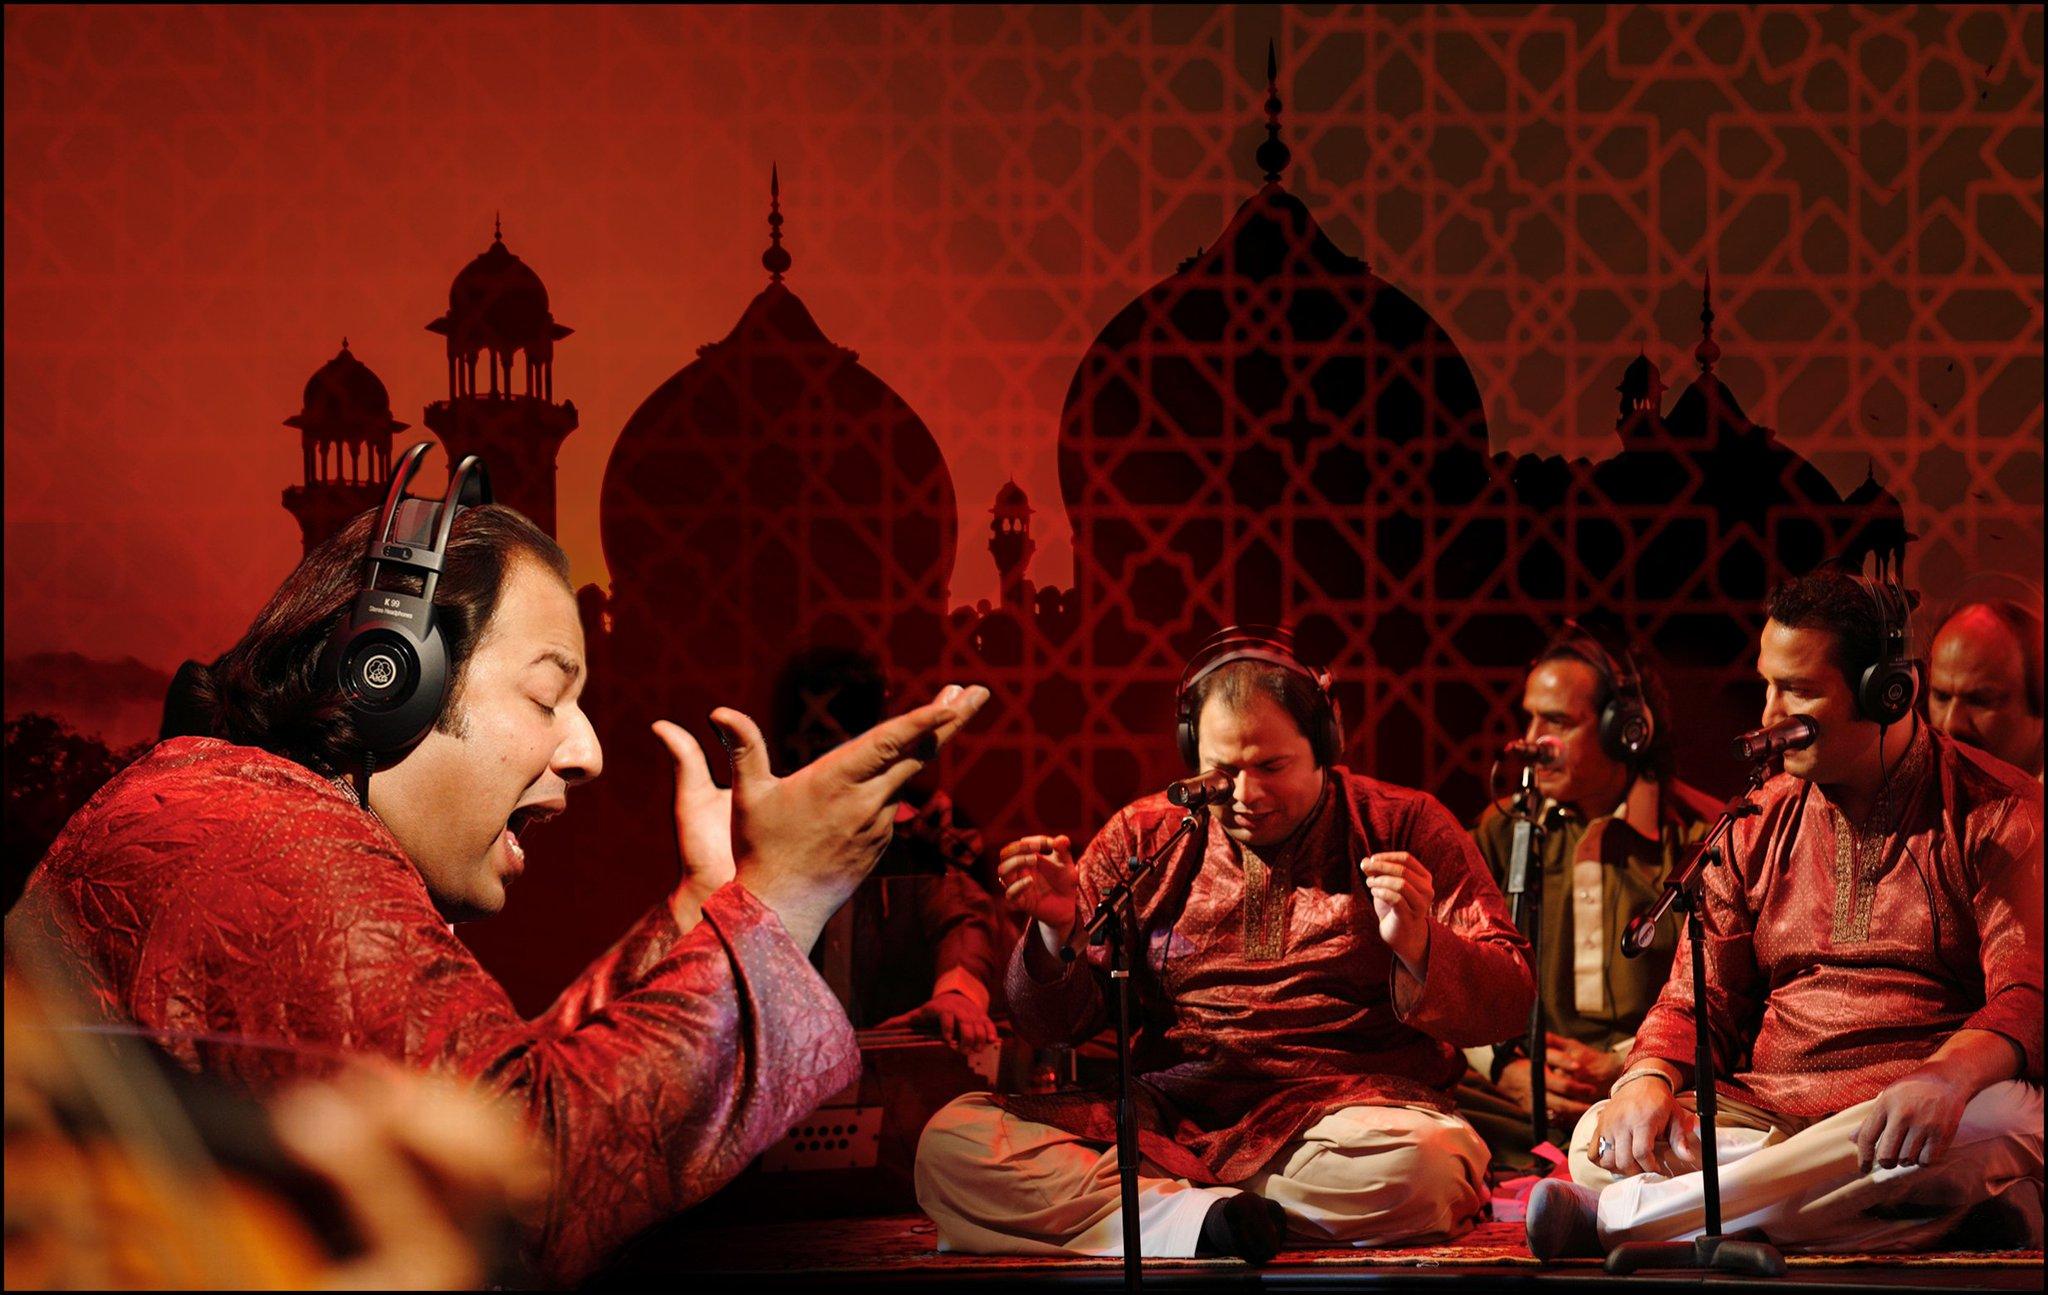 Sufi musicians #RizwanMuazzam talk to @EasternEye about their UK tour https://t.co/RzjVaSK7iA  @AsianArtsAgency @BarbicanCentre https://t.co/ukjNTtKsxP